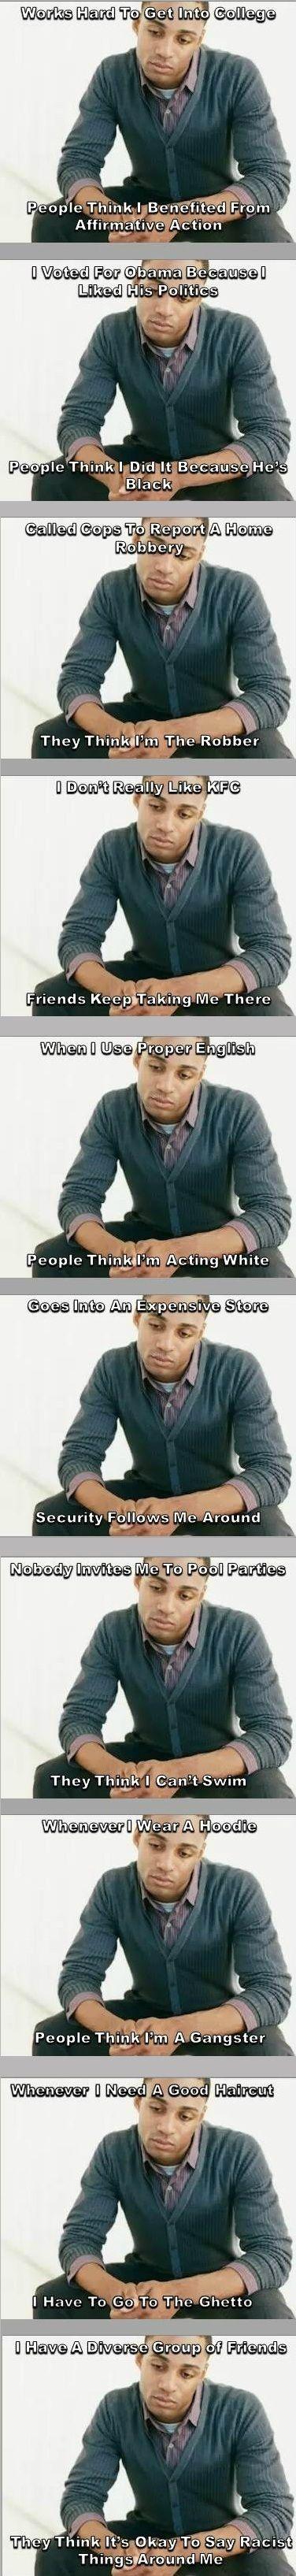 Black people problems.